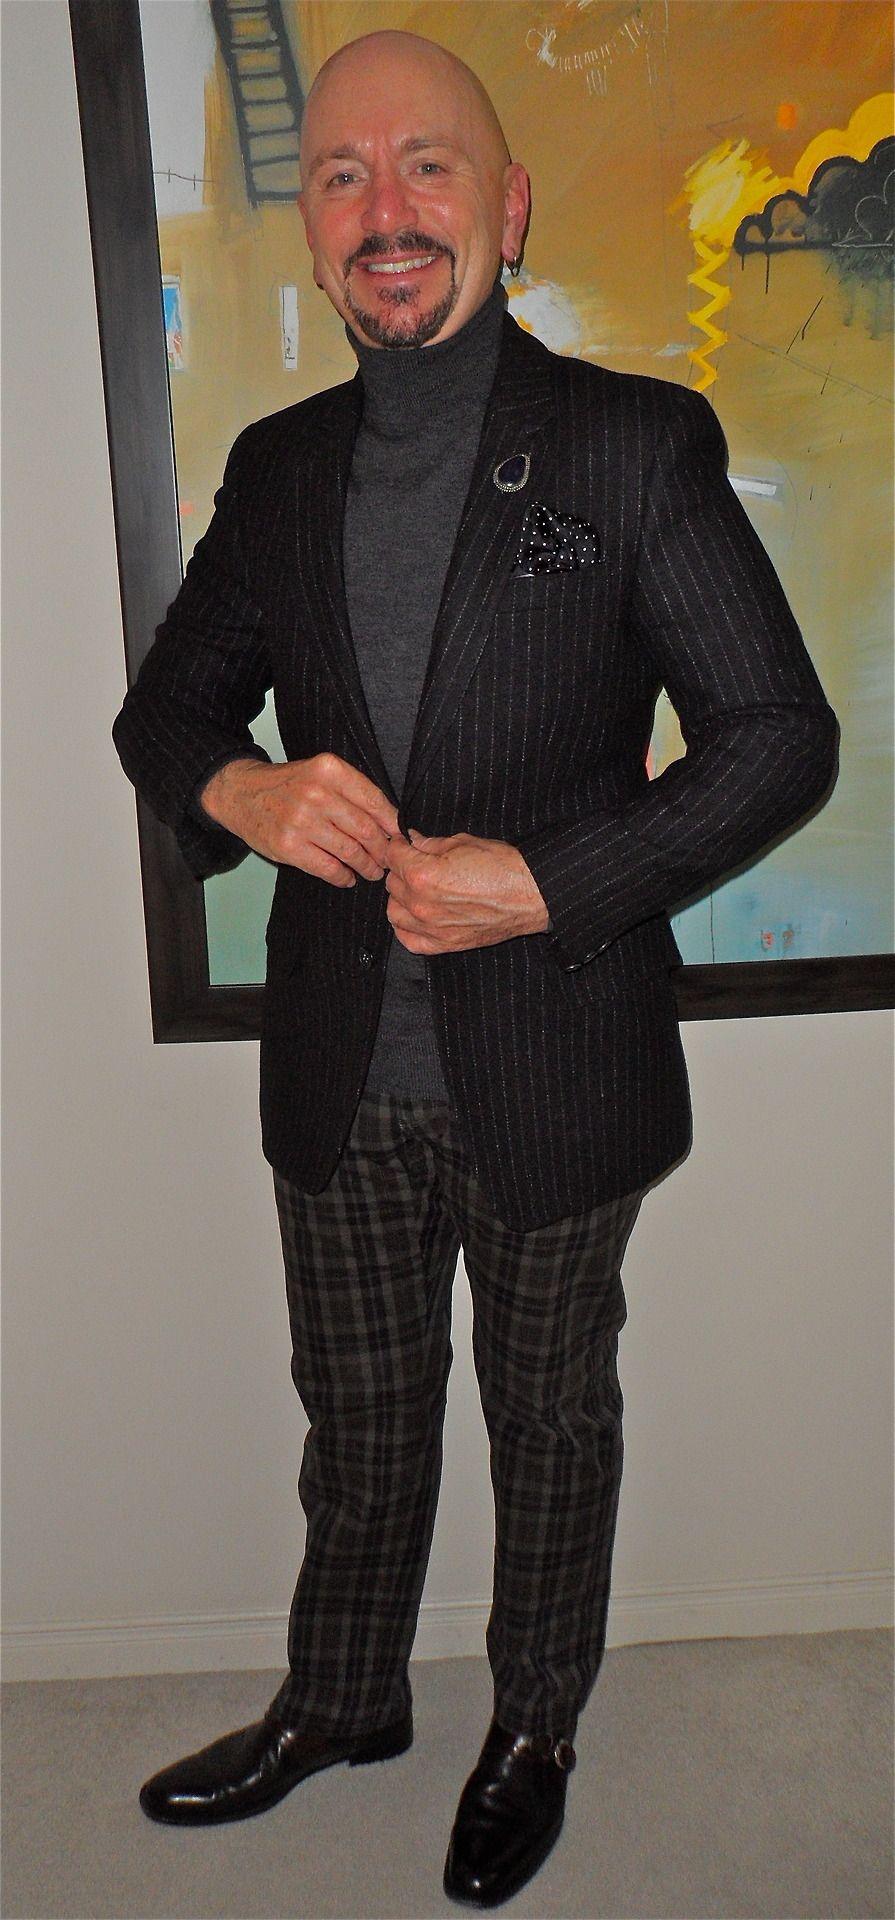 Moon blazer, Gap turtleneck, Mason's jeans, Italian leather bag, Lorenzo Banfi boots...